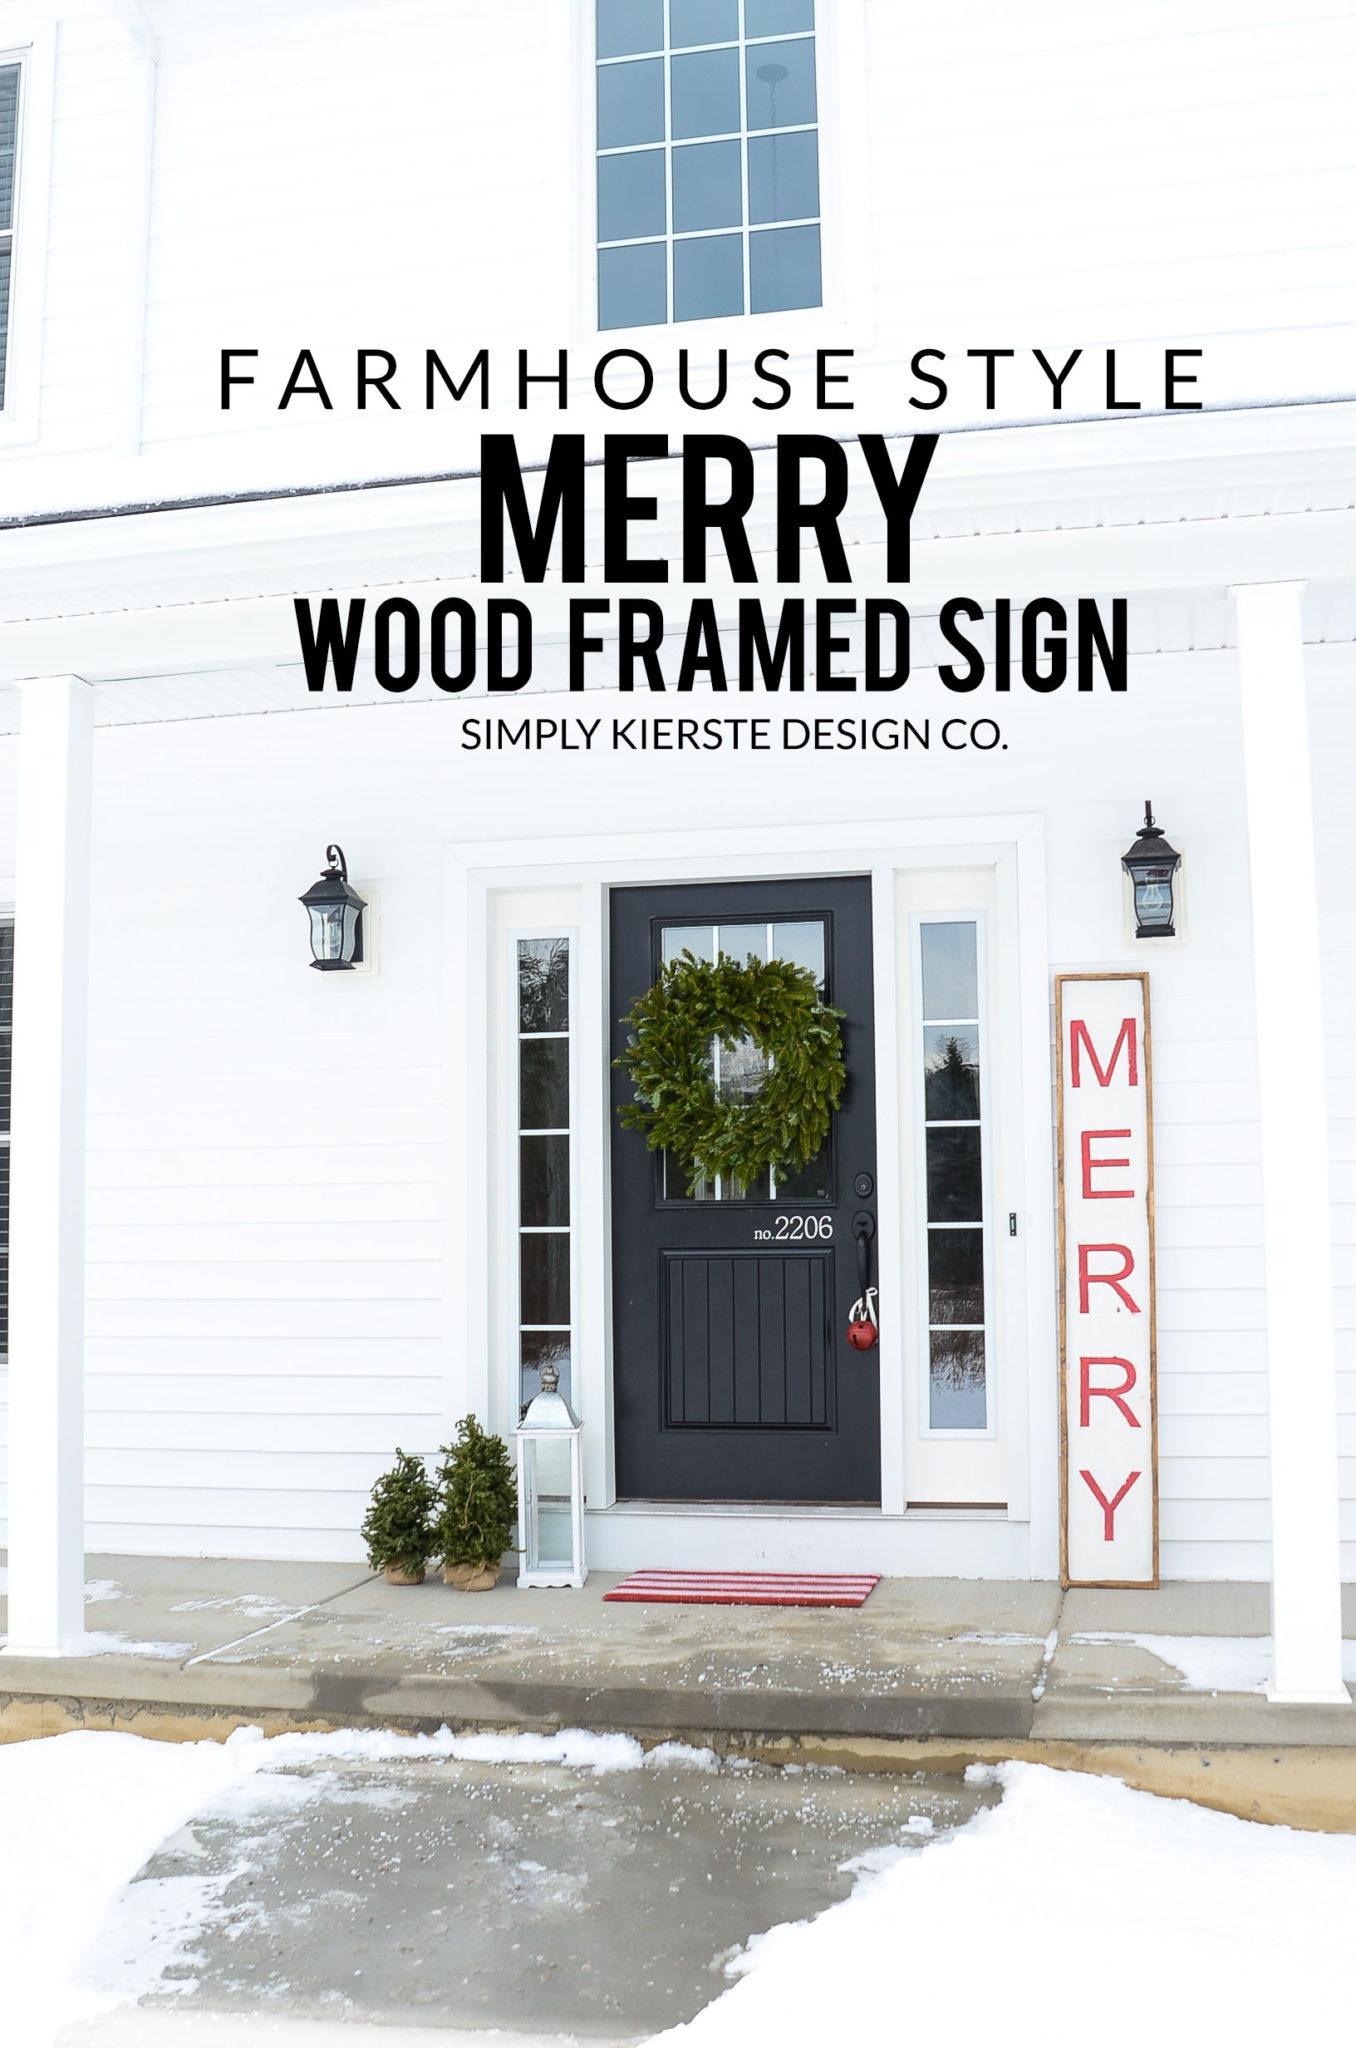 Merry Christmas Wood Sign | Farmhouse Style | simplykierste.com #woodsign #diychristmasdecor #christmassign